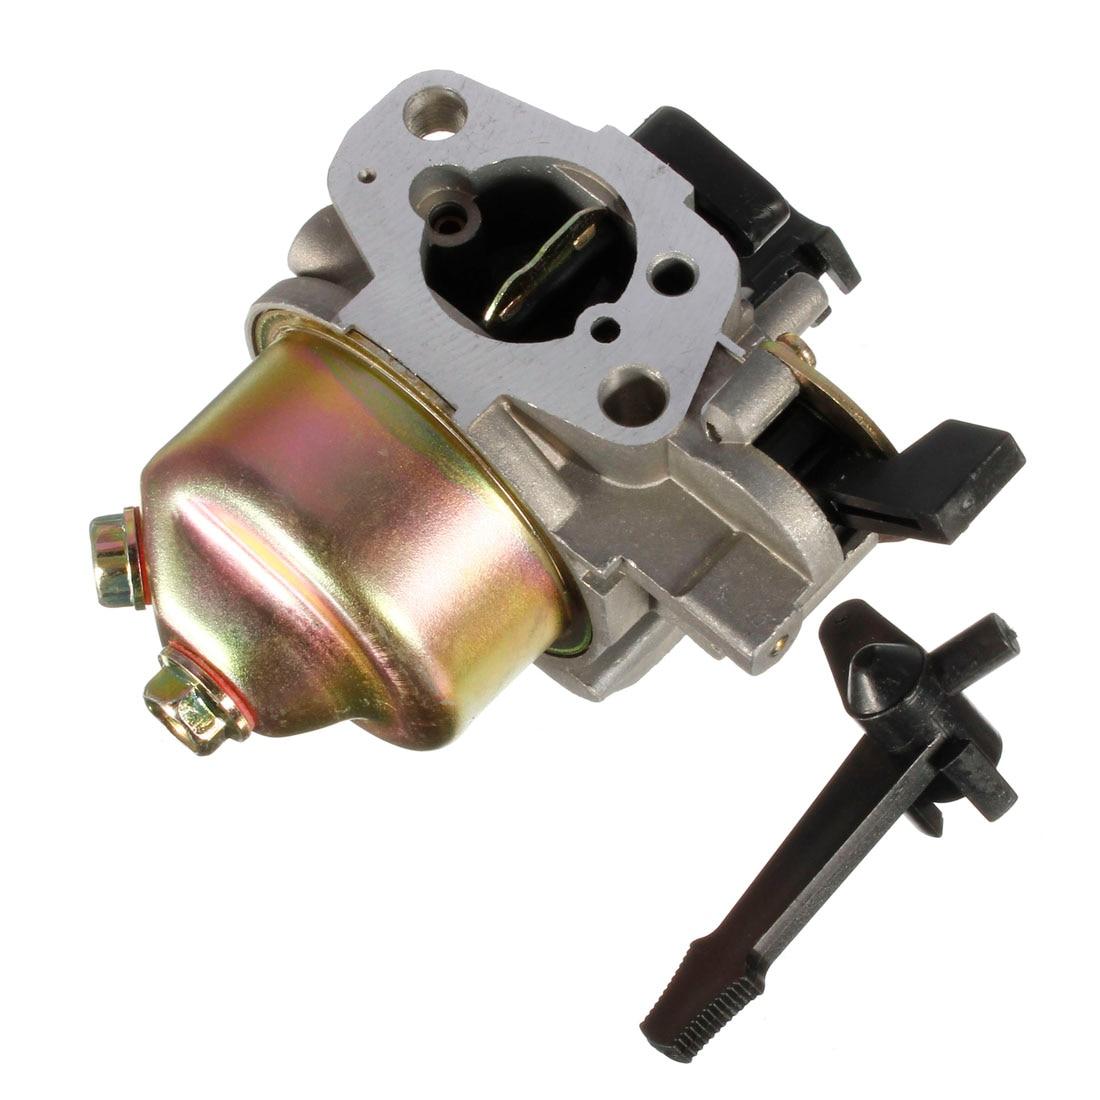 Kit carb do carburador de 19mm para honda gx160 5.5/6.5 para hp gx200 16100-zh8-w61